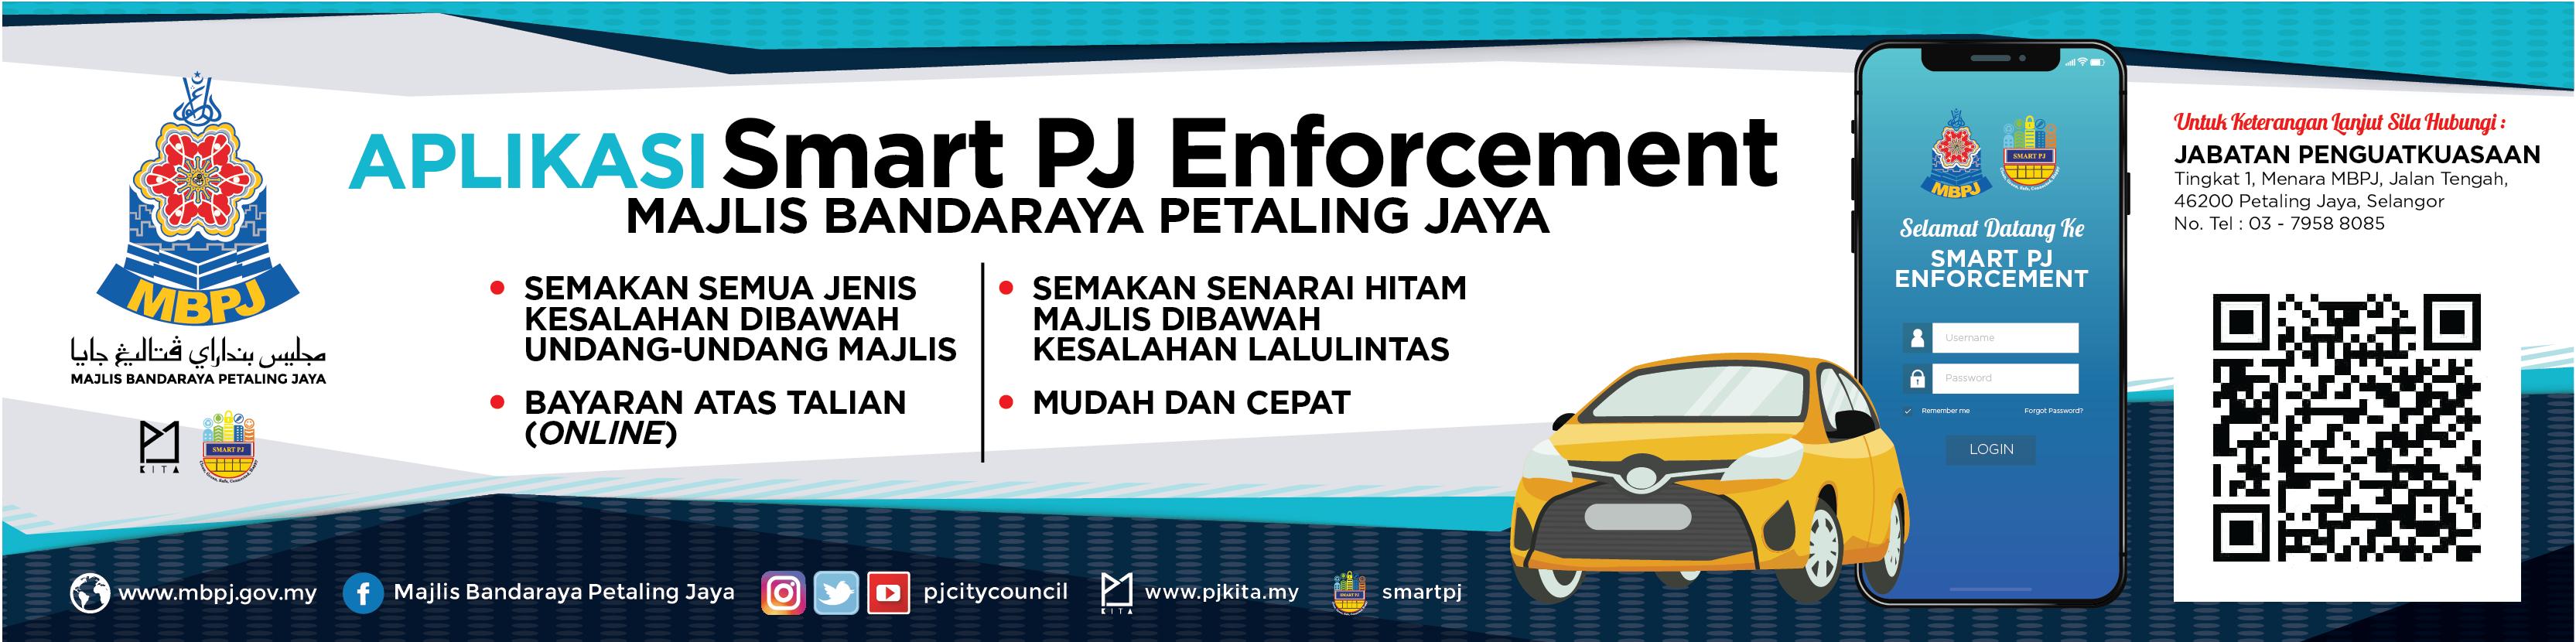 Banner Smart PJ Enforcement